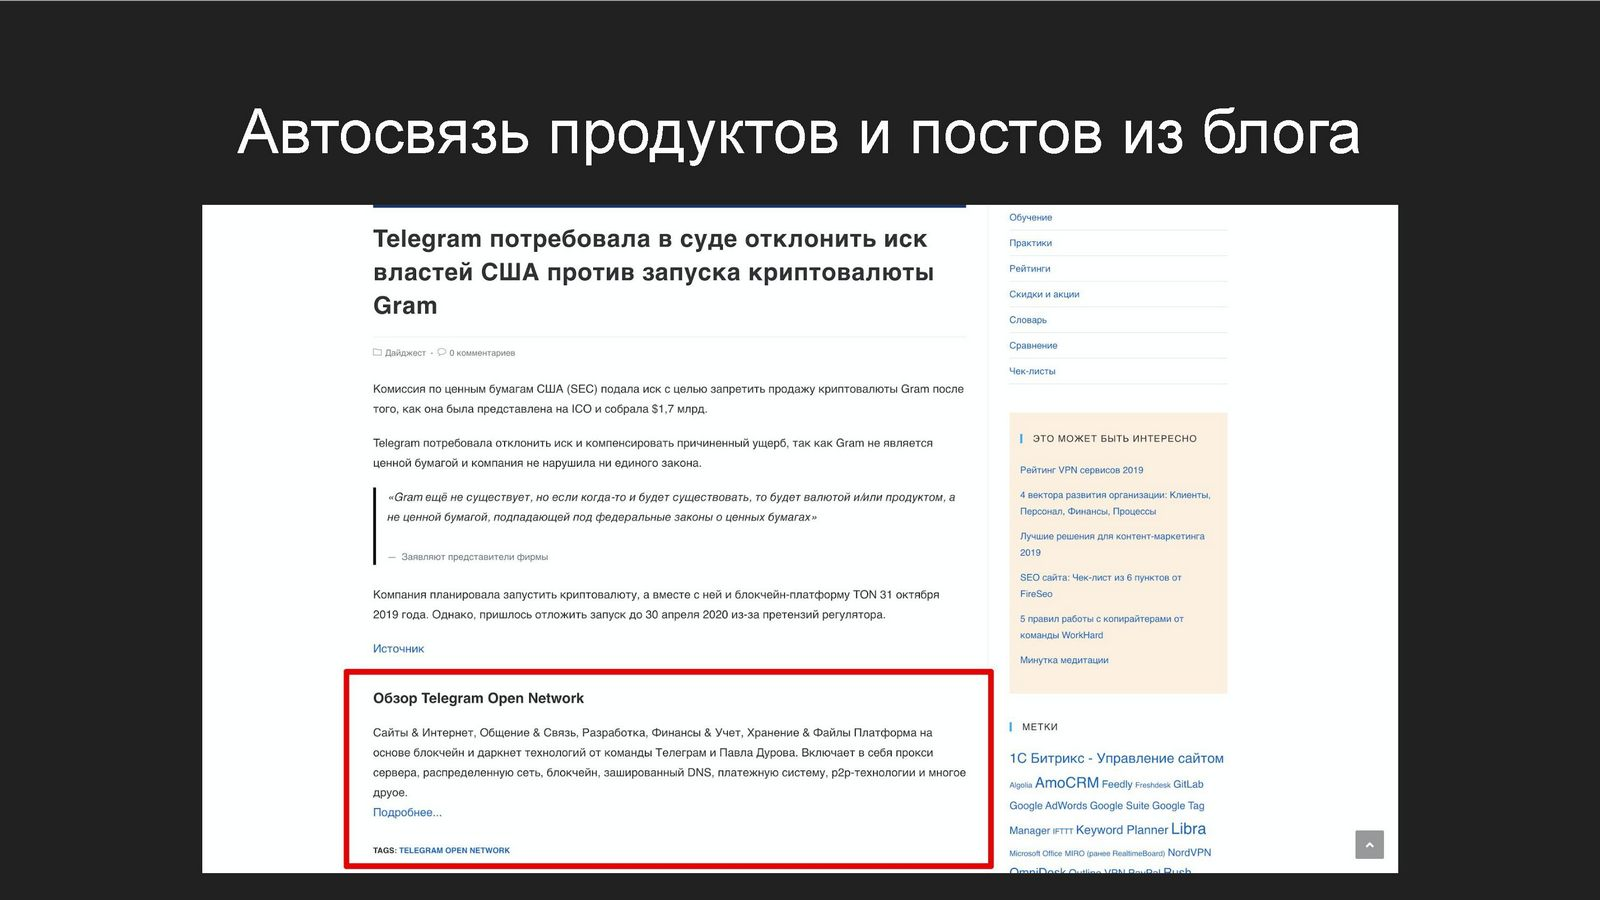 wp10-Анатолий Юмашев-Агрегатор bizzapps.ru 16